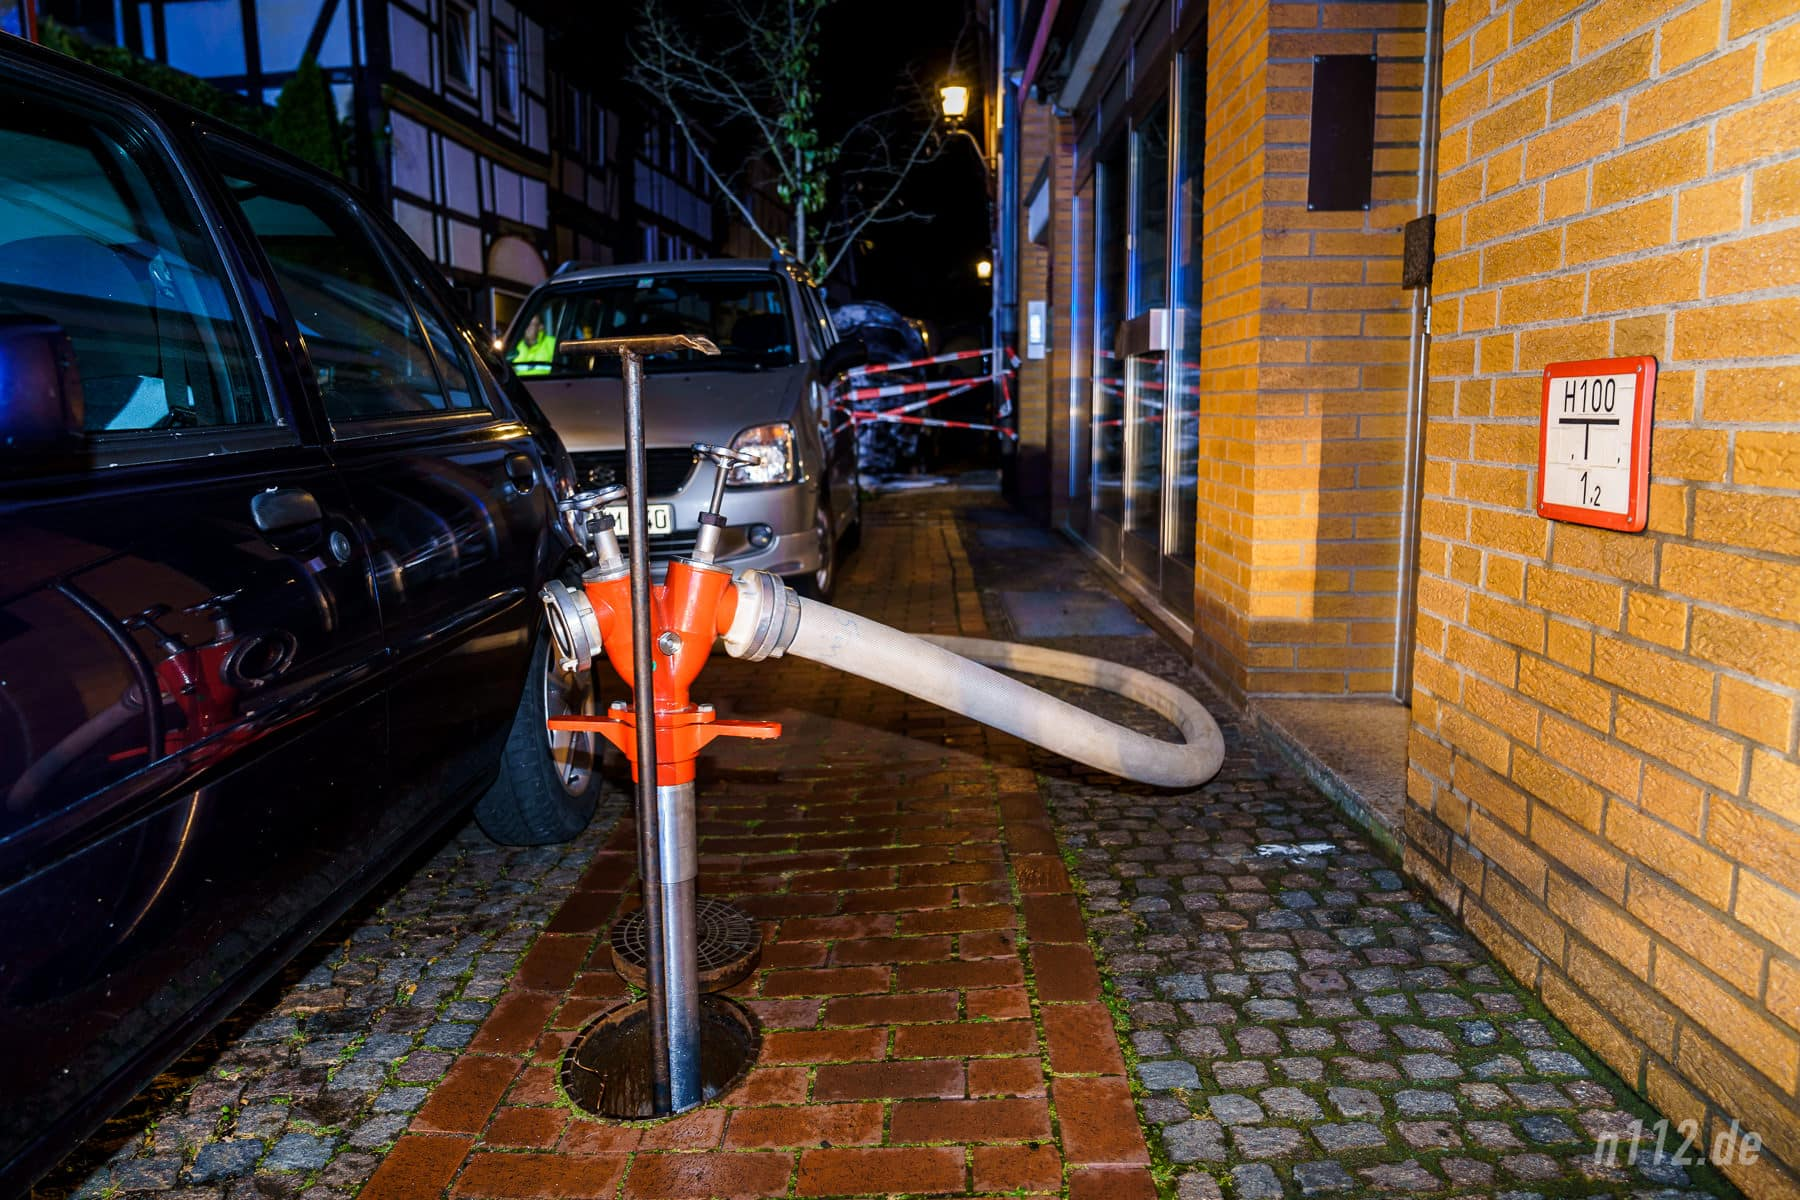 Hat man mal in der Fahrschule gelernt: Hydranten sind freizuhalten... (Foto: n112.de/Stefan Simonsen)